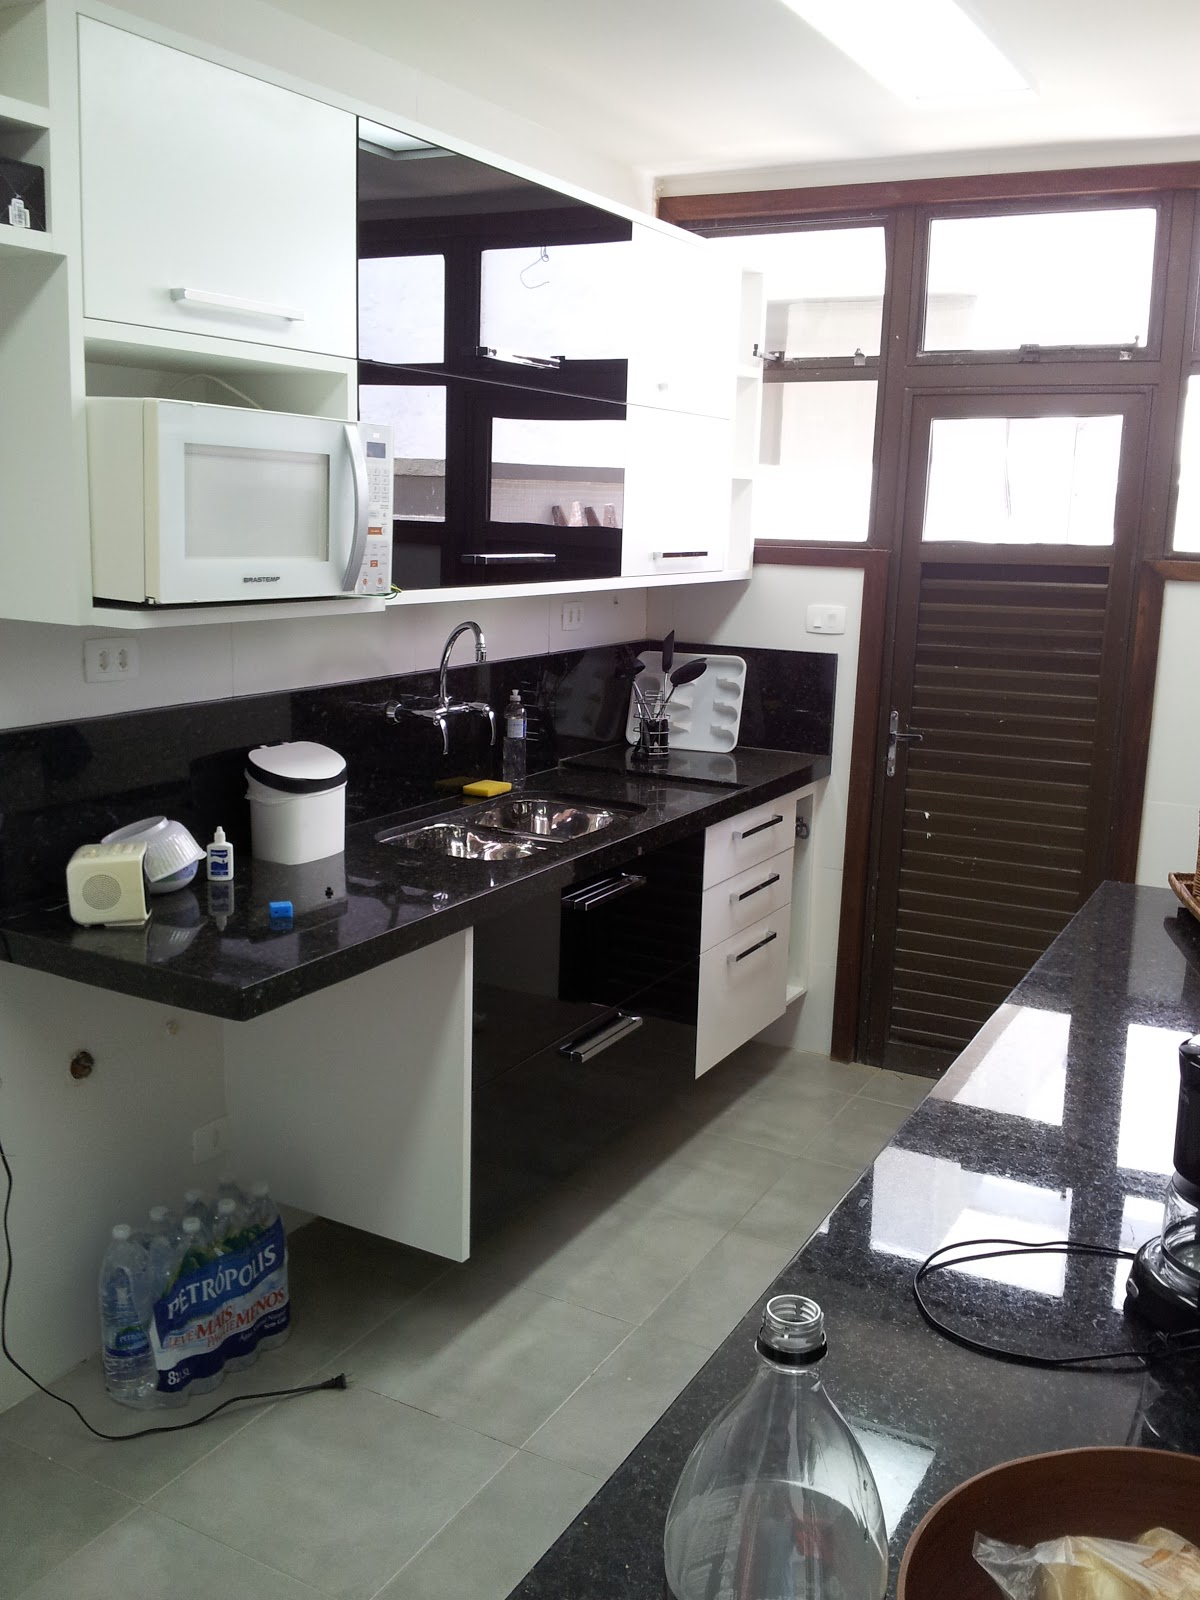 .com/ ReginaSegura. arquitetura: Reforma cobertura Barra da Tijuca #614C4C 1200x1600 Arquitetura Piso Banheiro